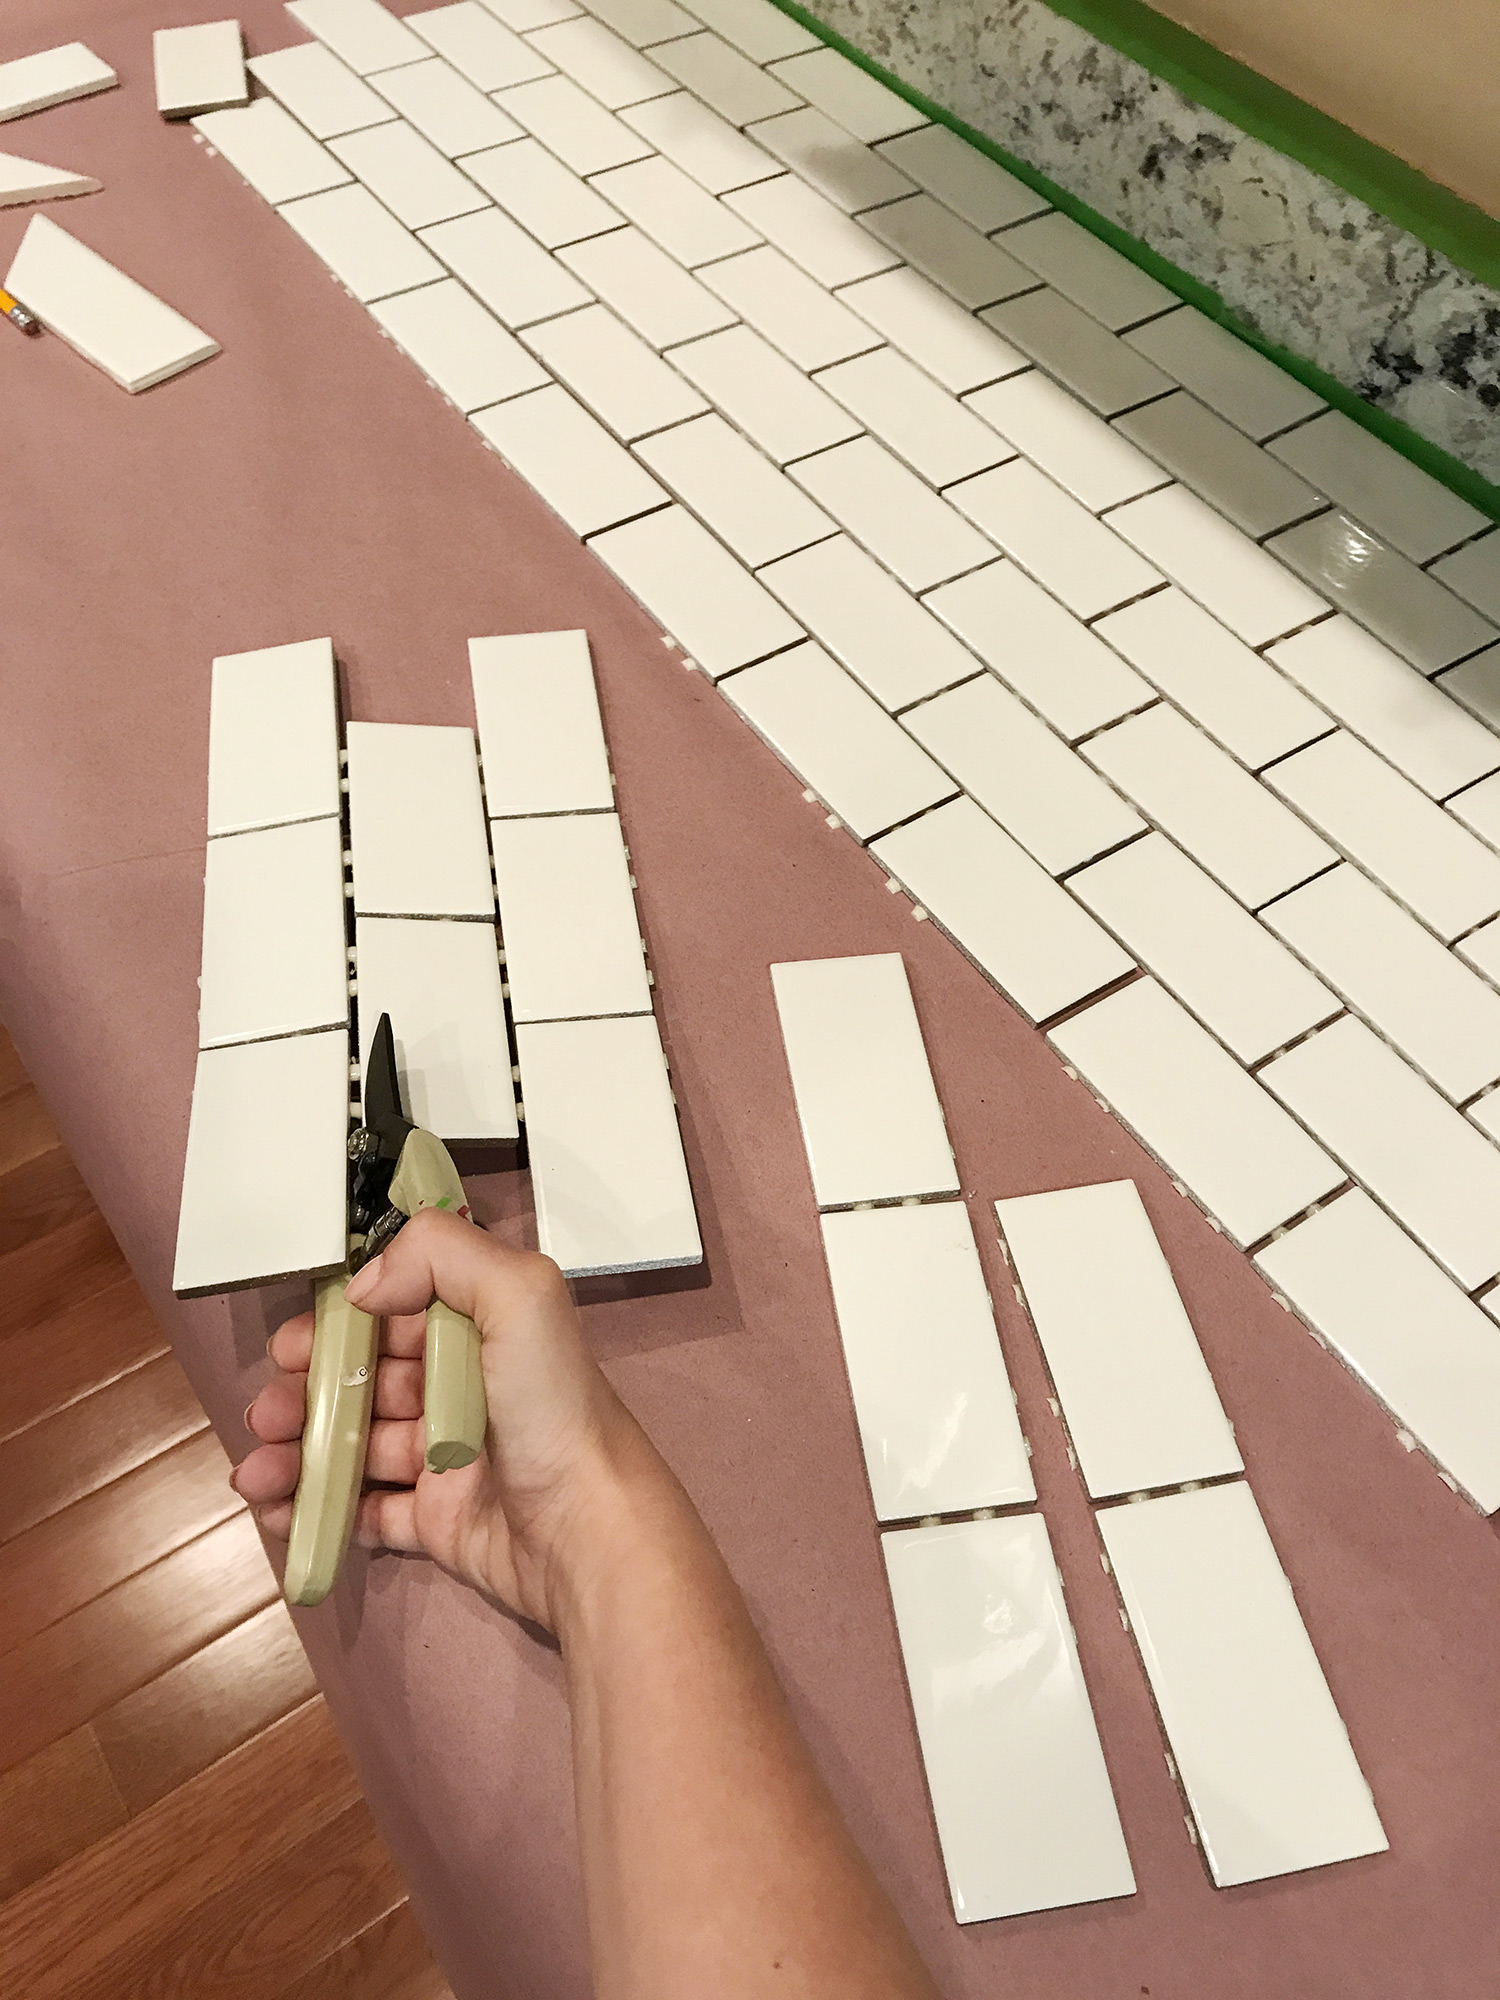 How-to-add-a-subway-tile-backsplash-wallpaper-wp4005372-1